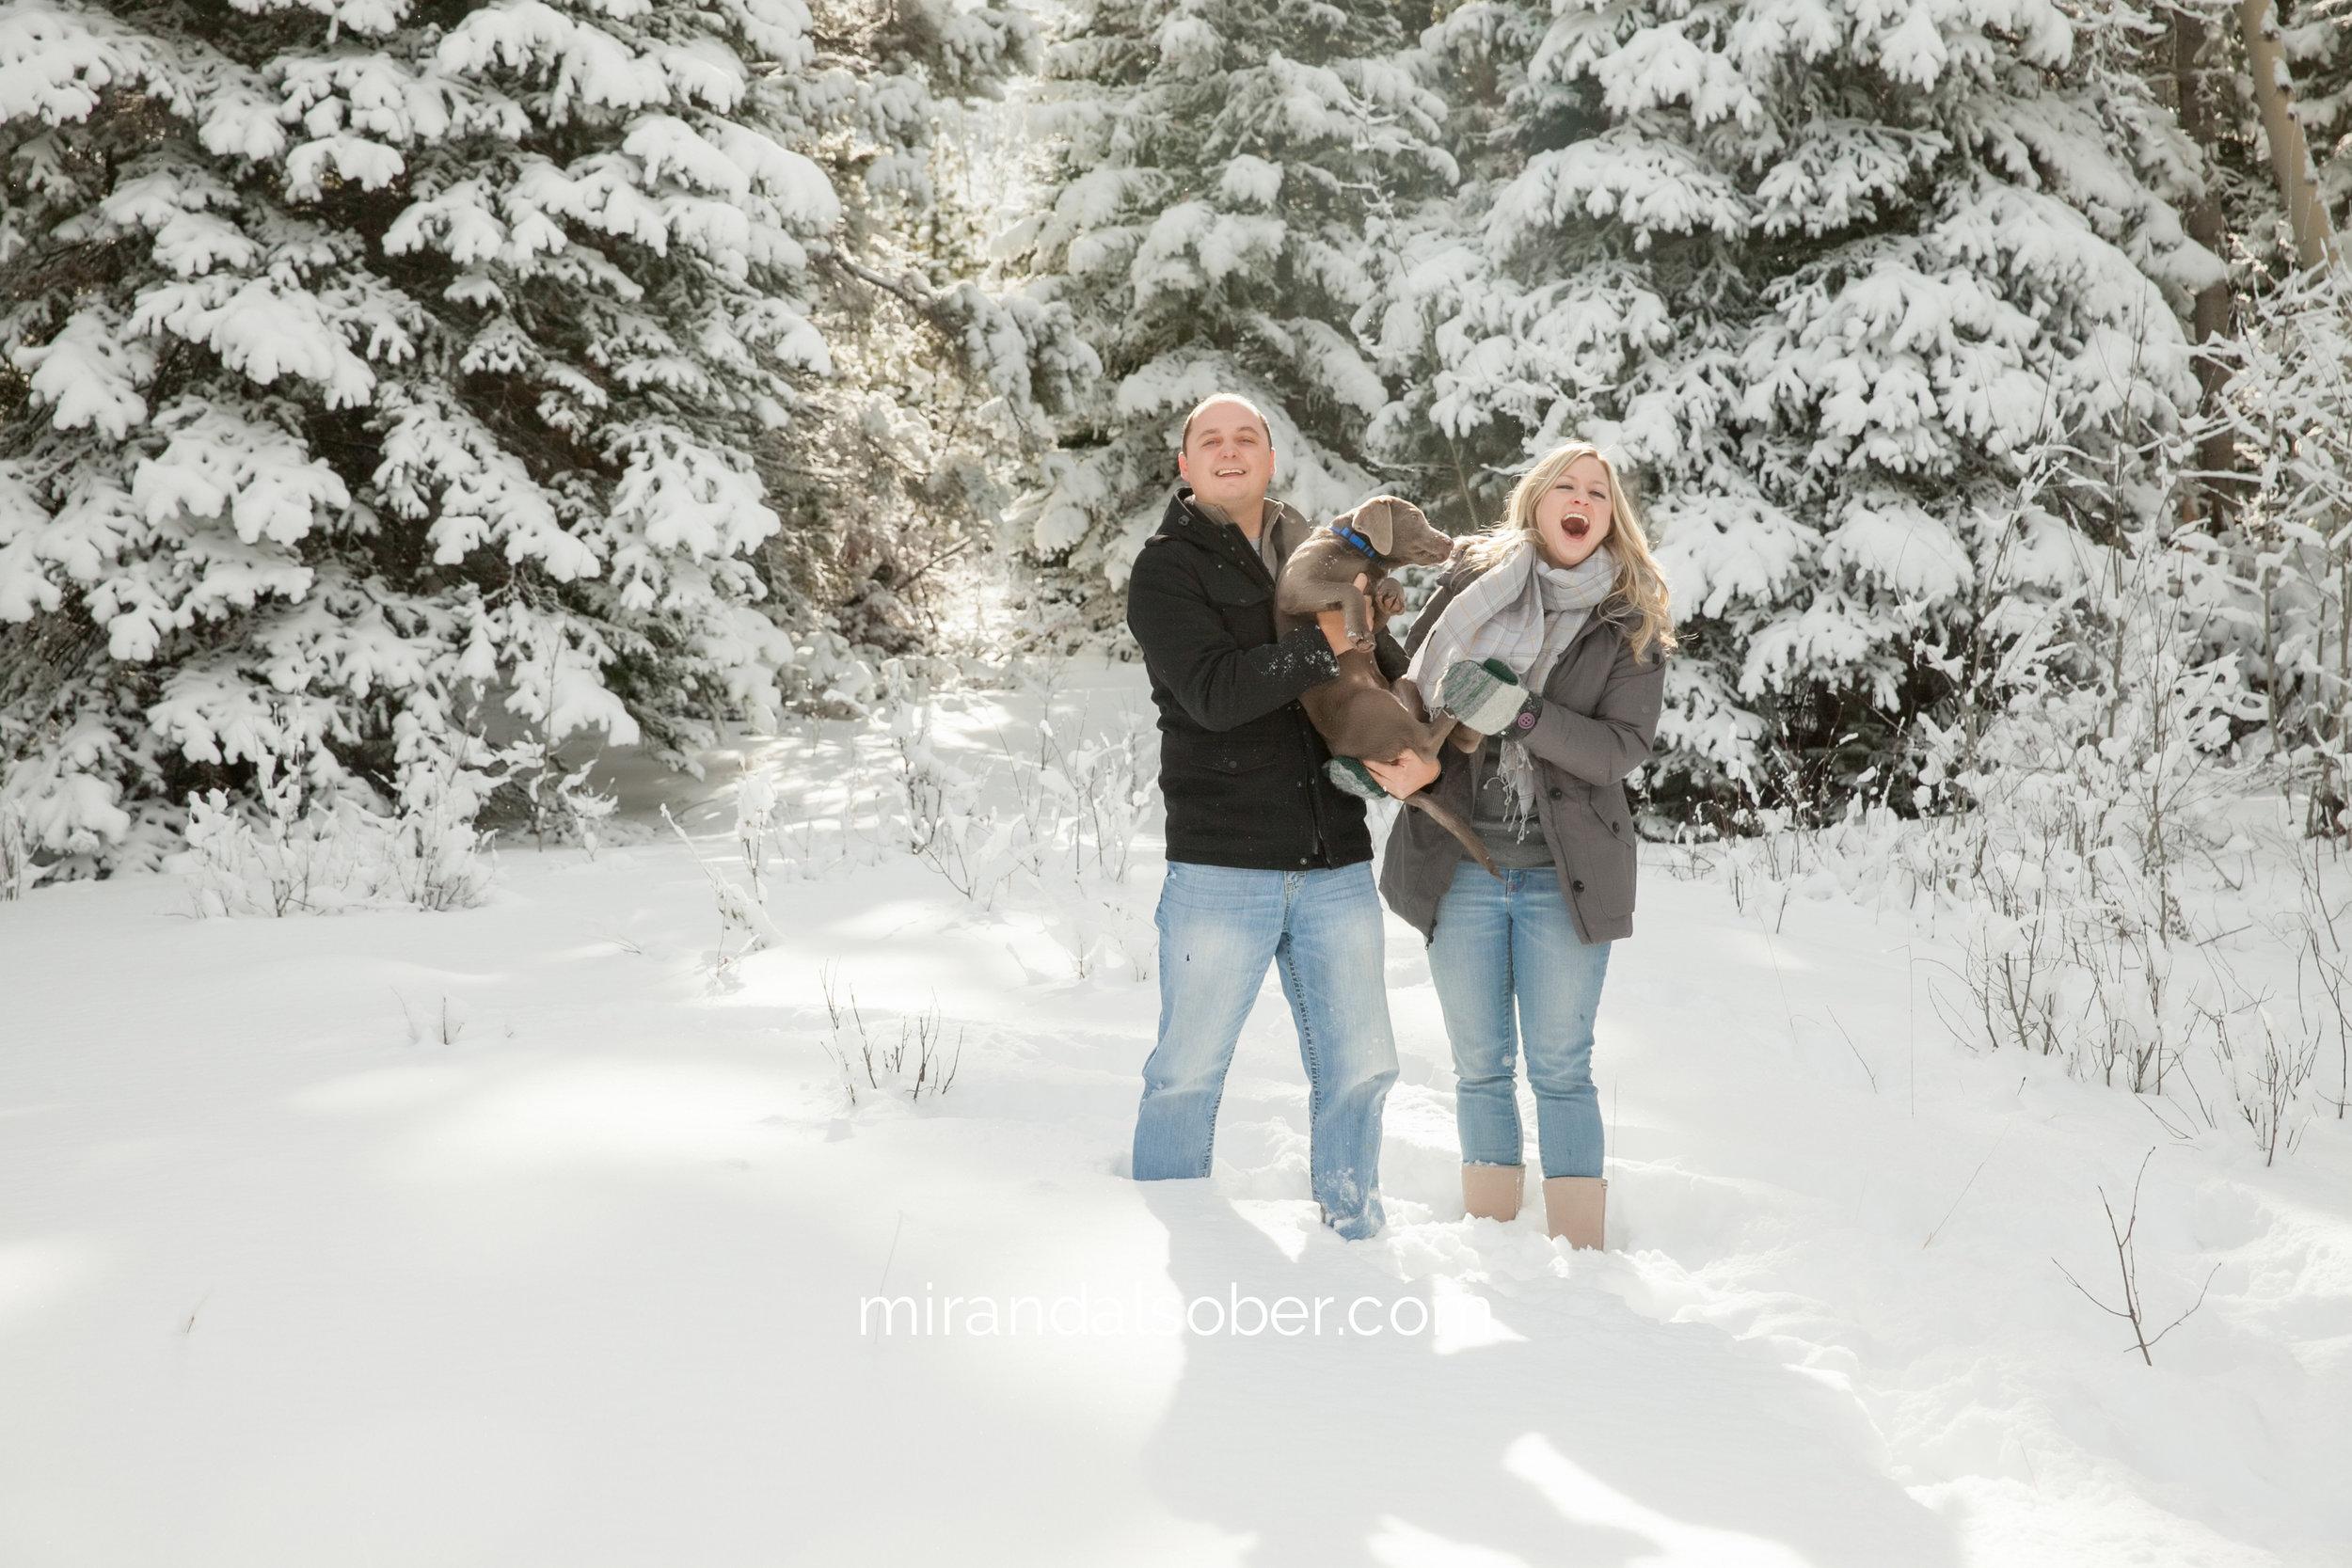 fort collins holiday photos, Miranda L. Sober Photography, snow photos